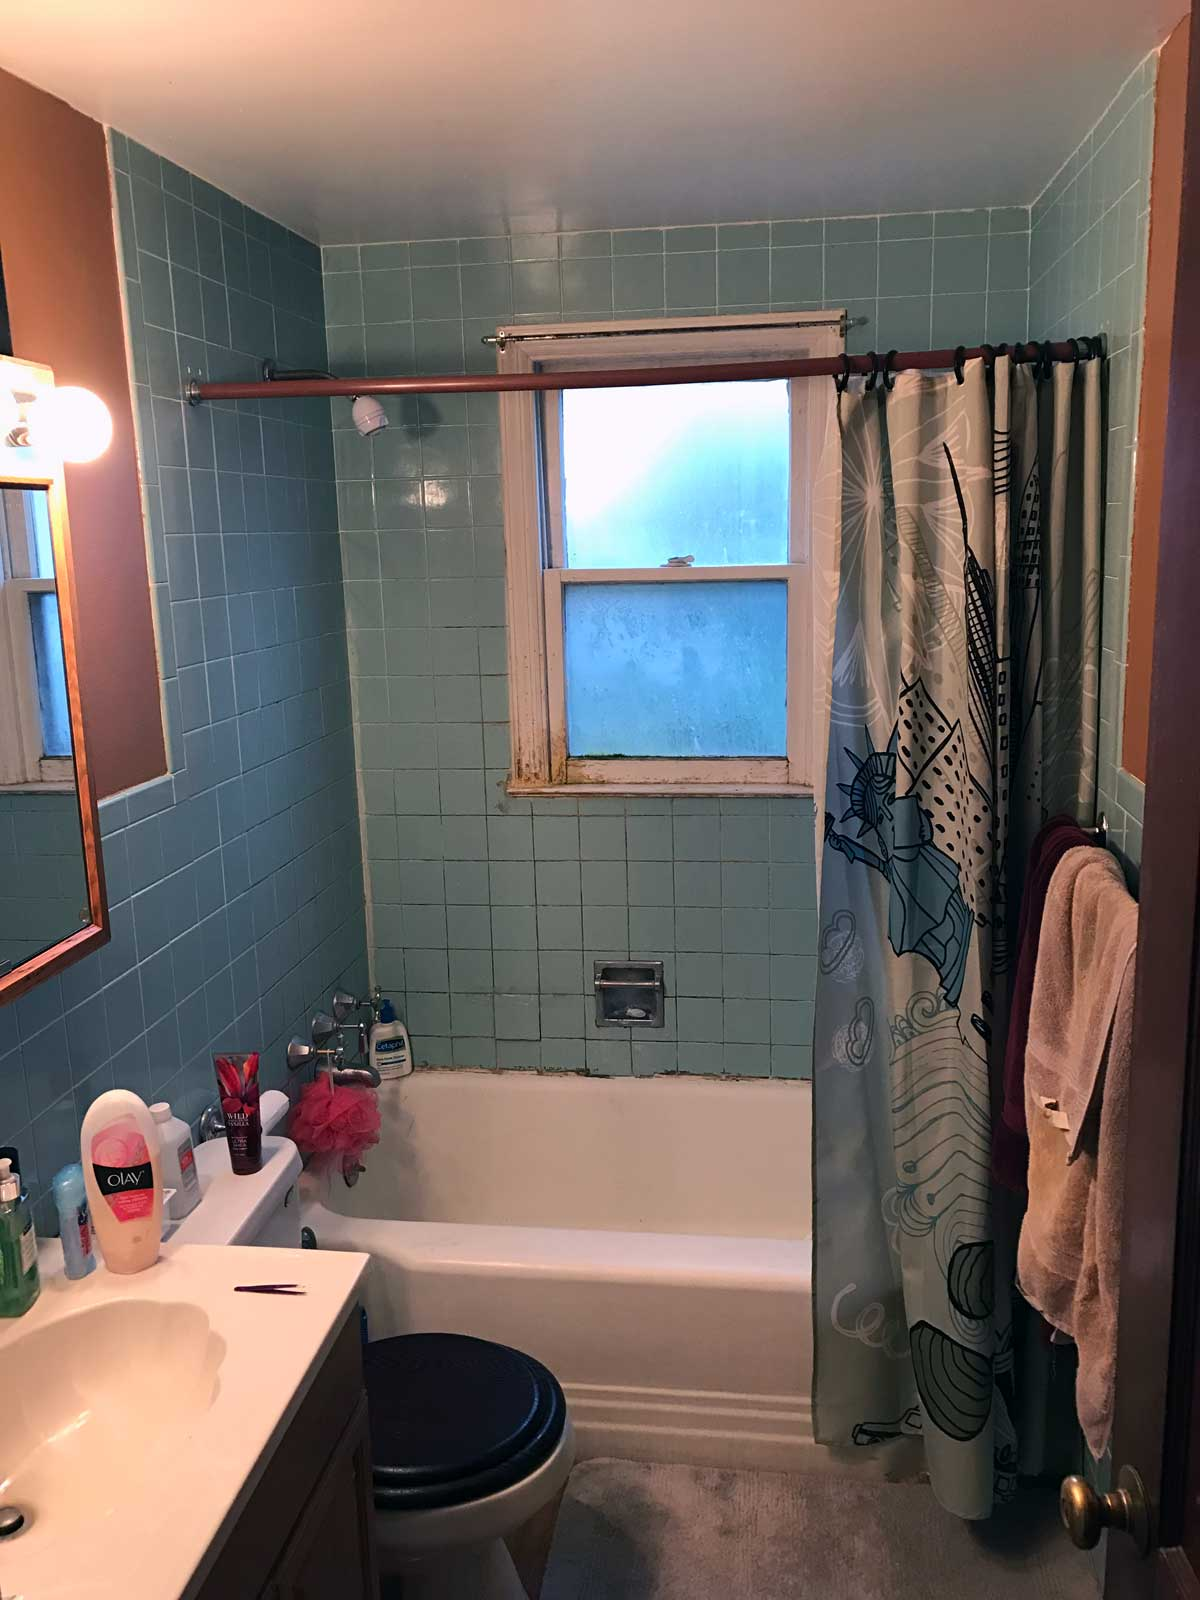 15 Day Bathroom Renovation Before 01